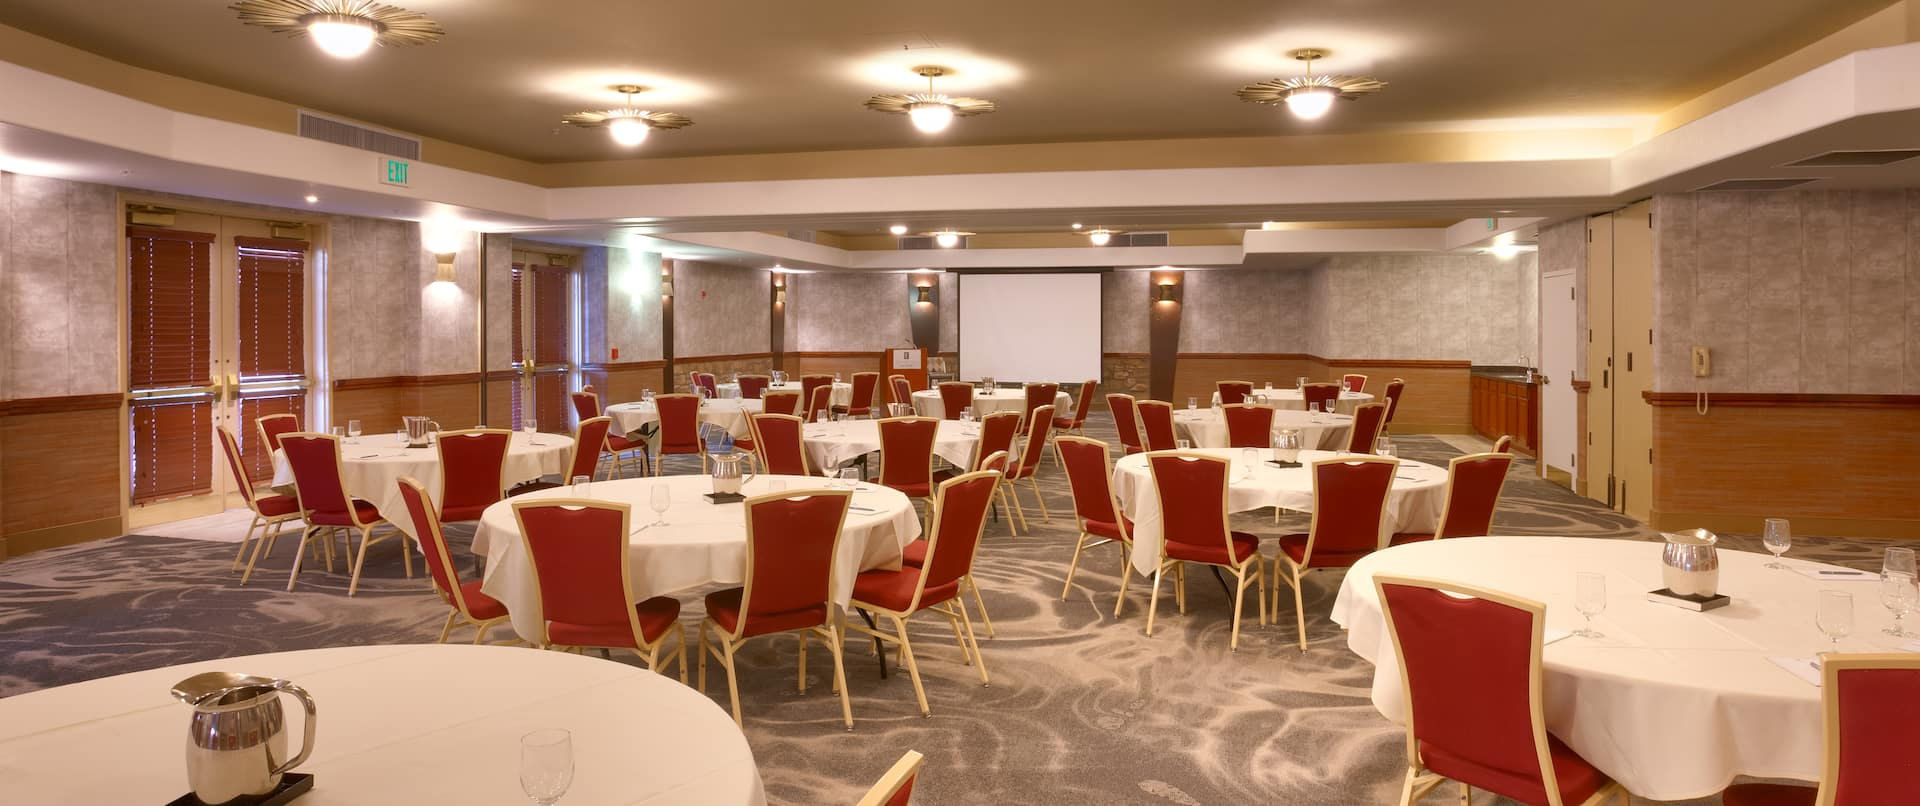 La Paloma Ballroom